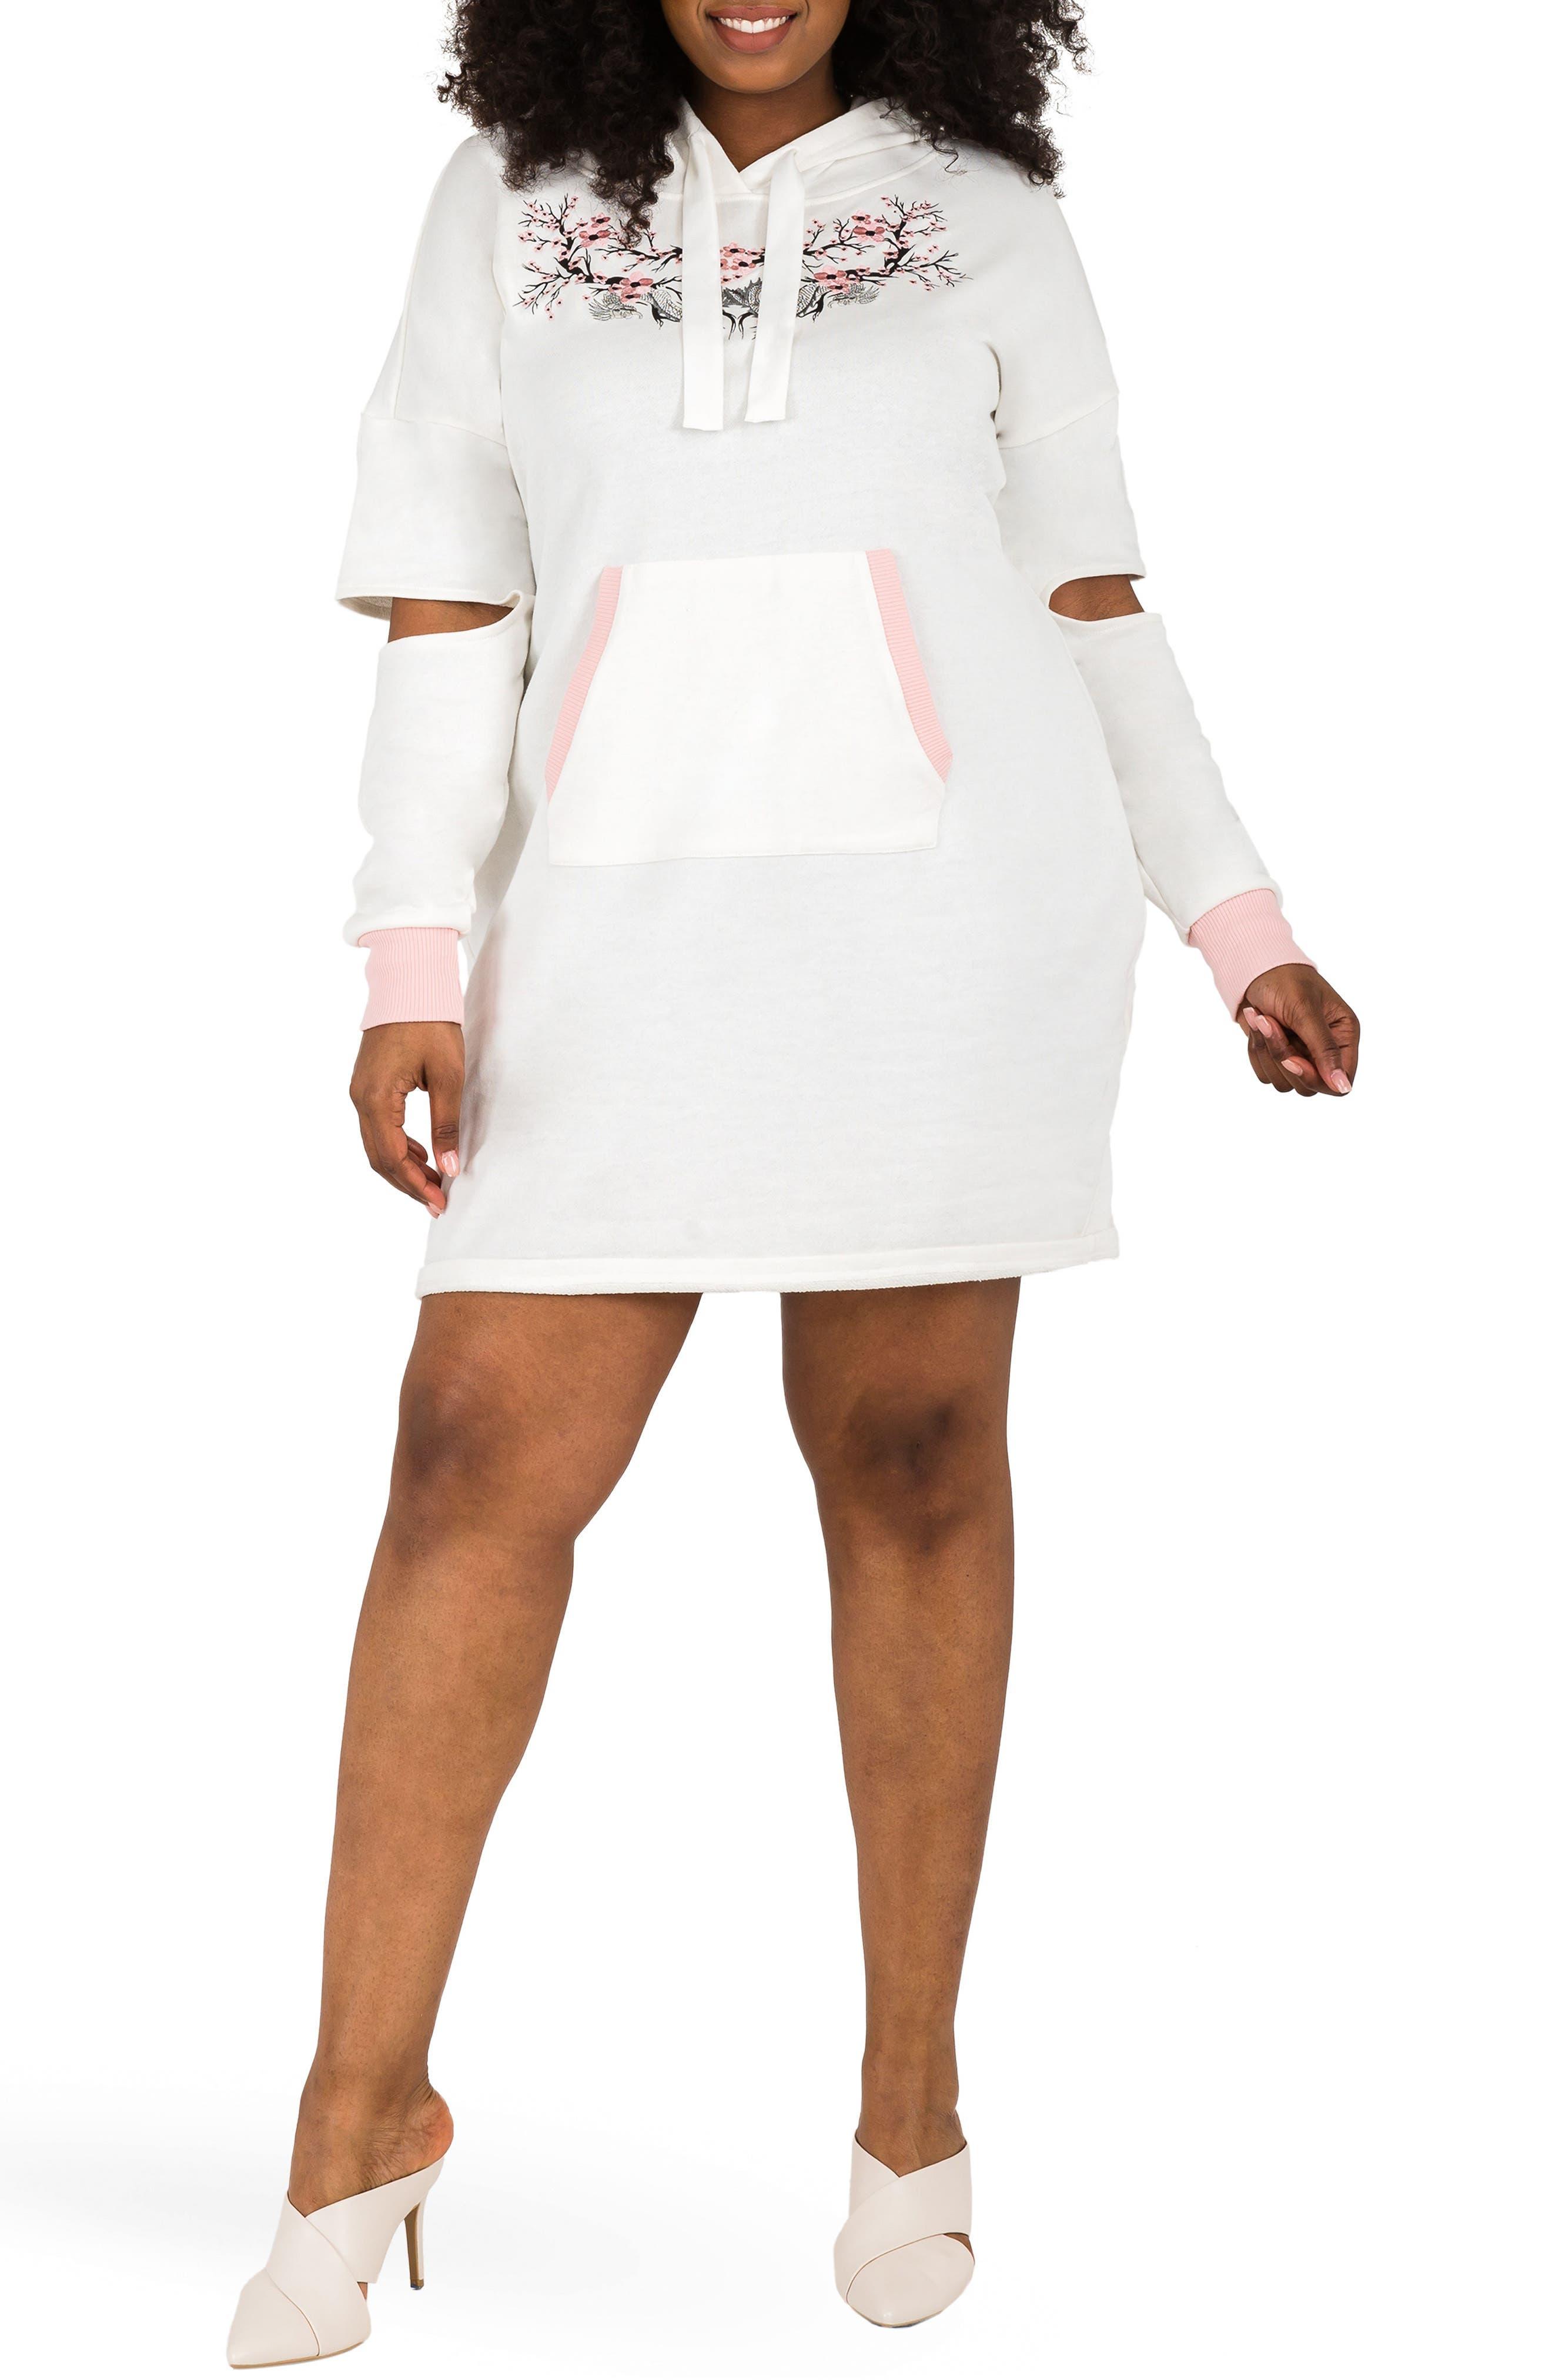 POETIC JUSTICE, Cylene Hoodie Dress, Main thumbnail 1, color, QUARTZ WHITE